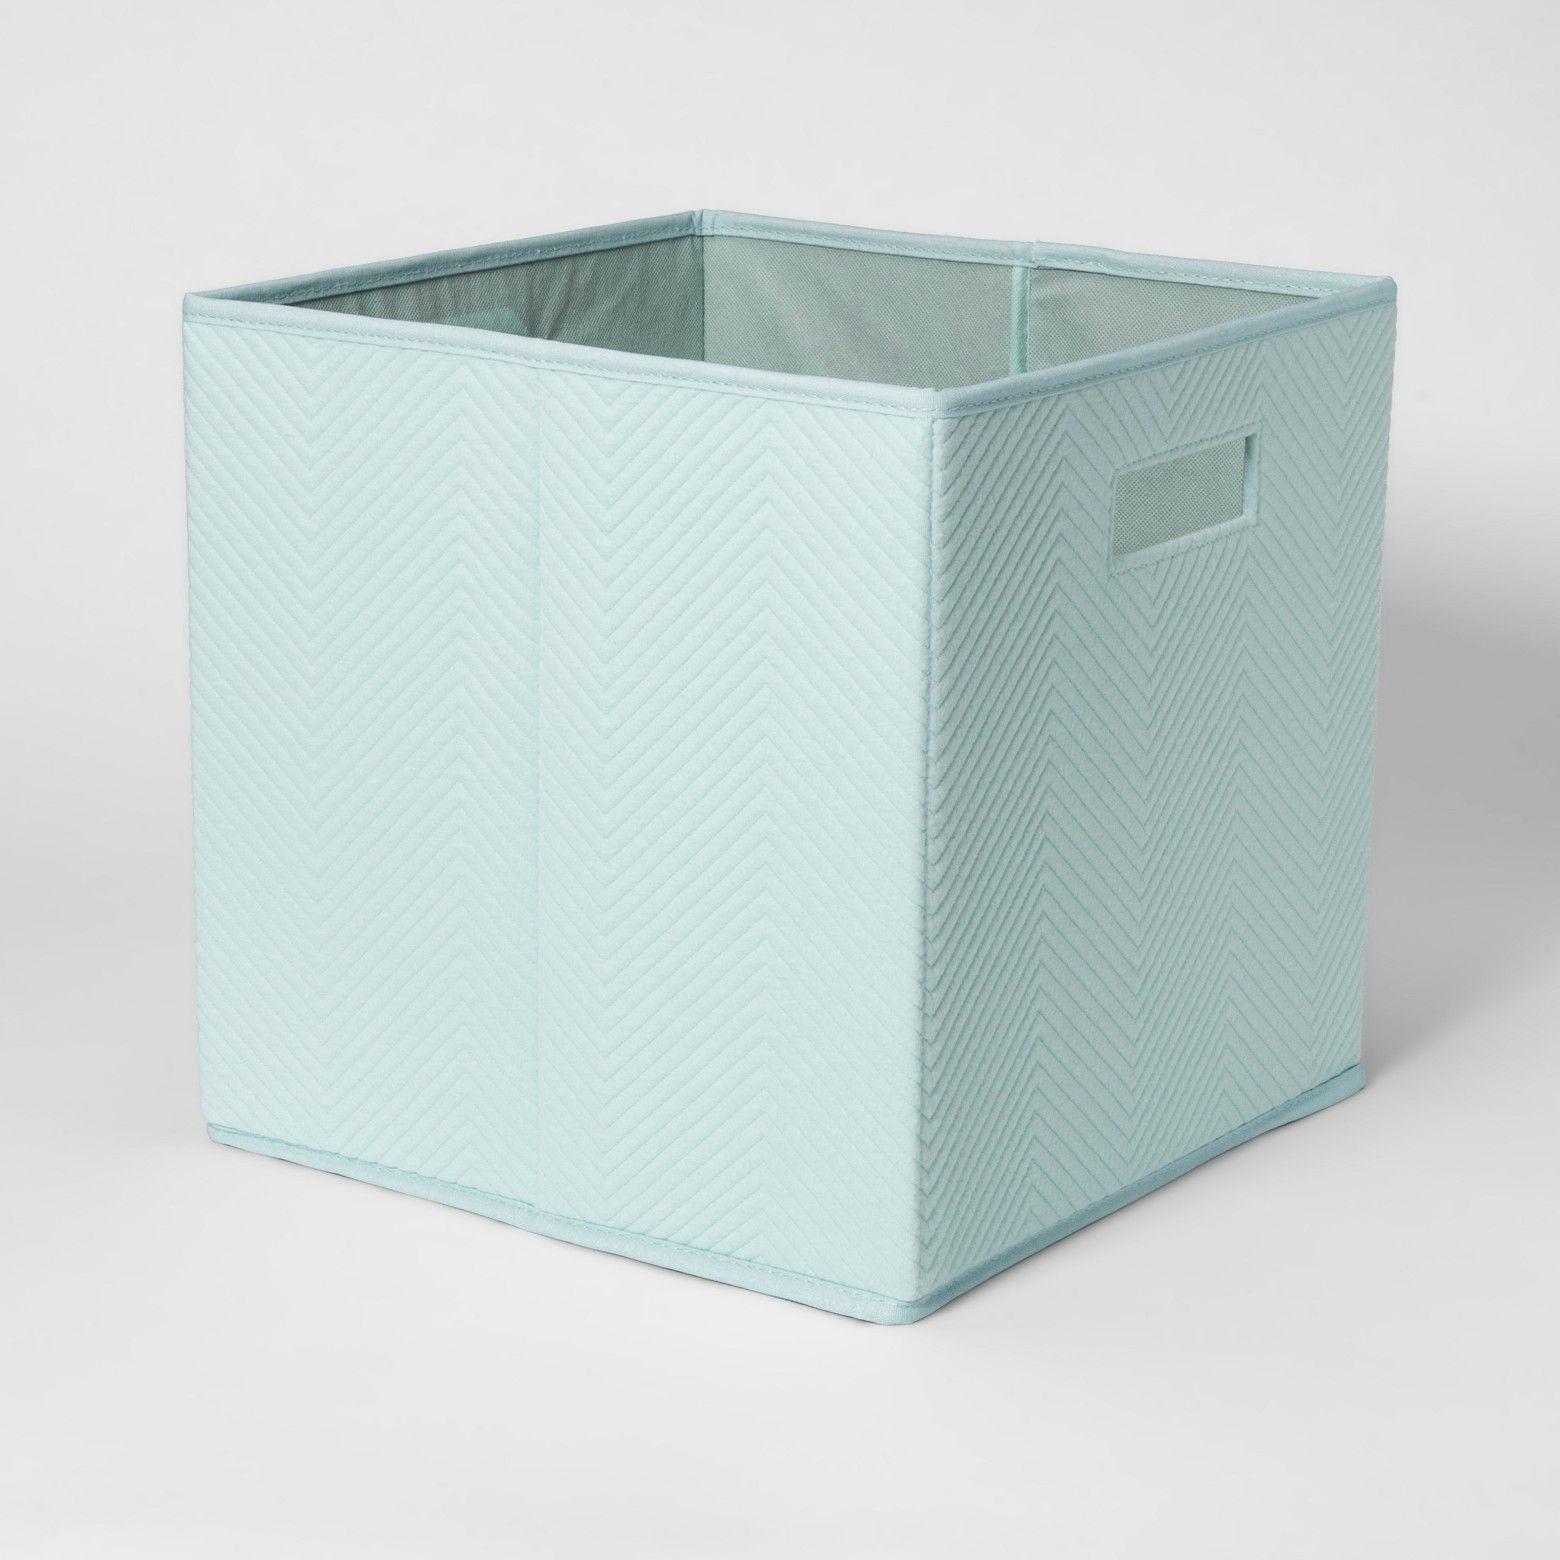 13 X13 Fabric Cube Storage Bin Pillowfort Cube Storage Bins Cube Storage Toy Storage Bins